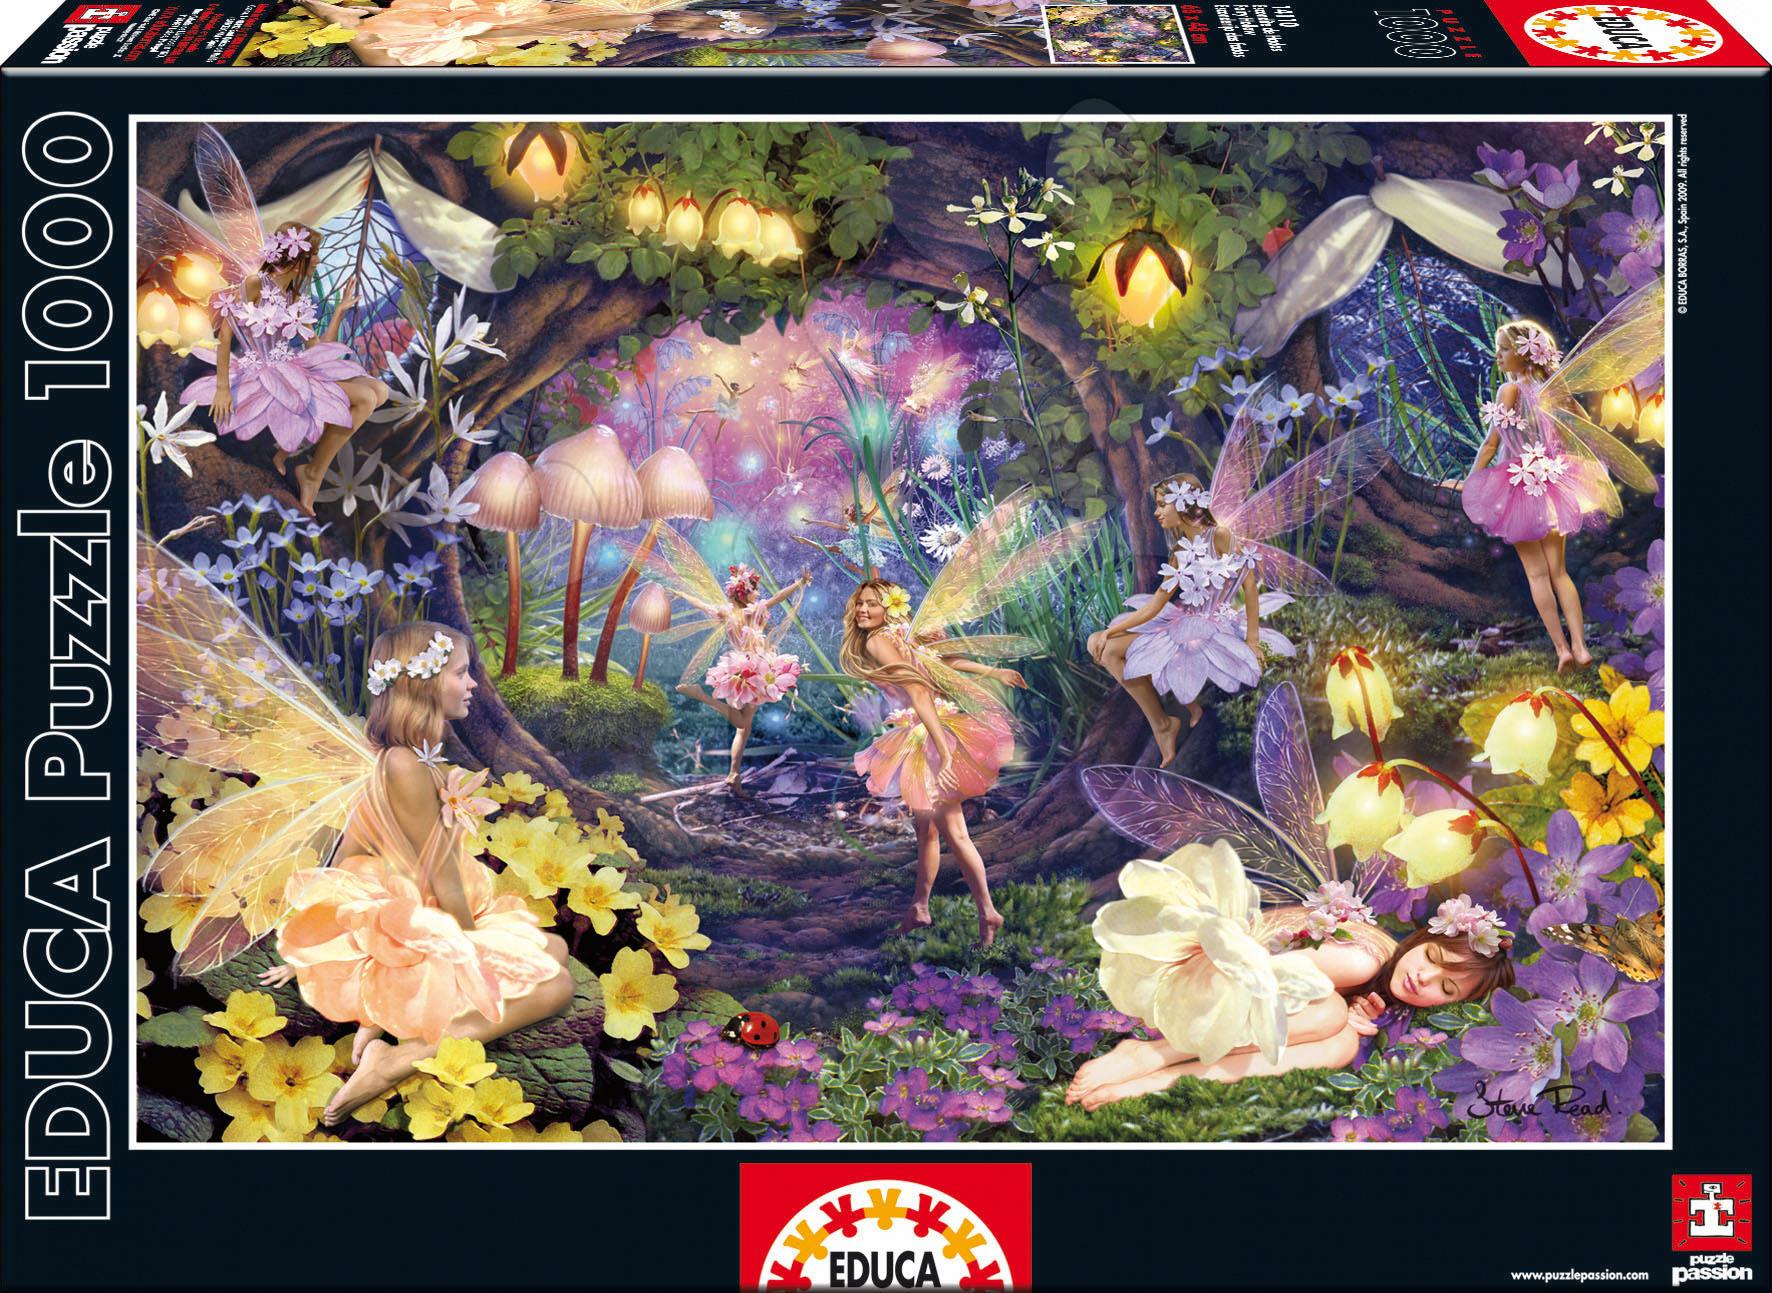 Educa 14110 PUZZLE 1000 delov Fairy hollow 68 x 48 cm+ FIX PUZZLE LEPILO od 12 leta